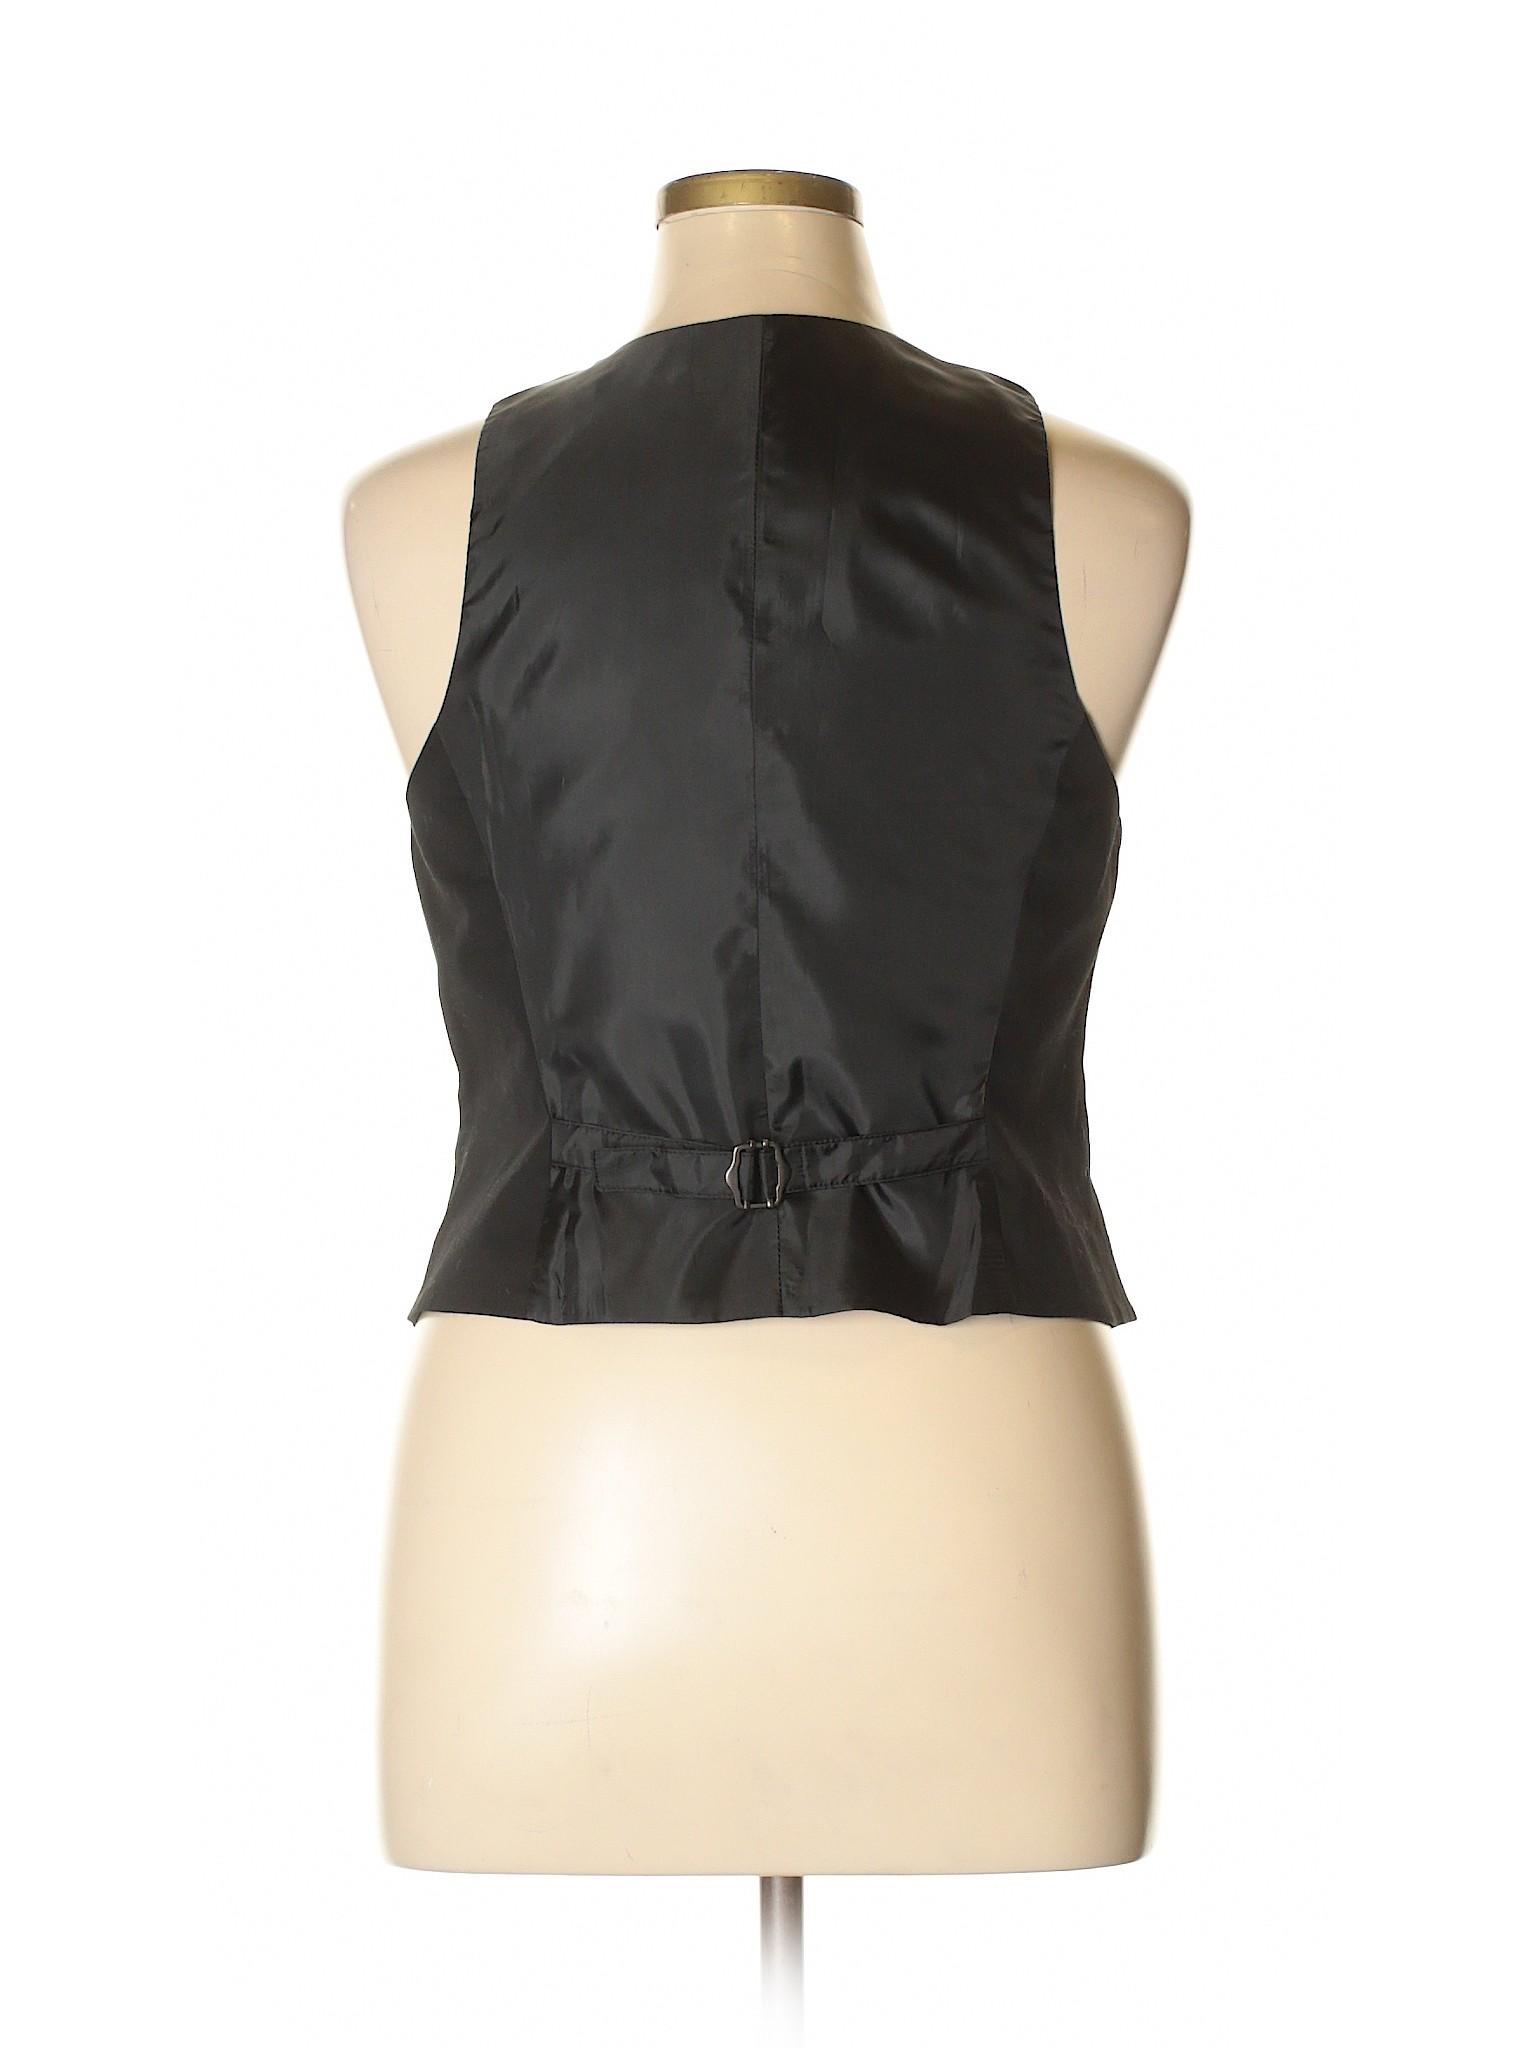 Vest Boutique winter New York Company amp; wYHvpq